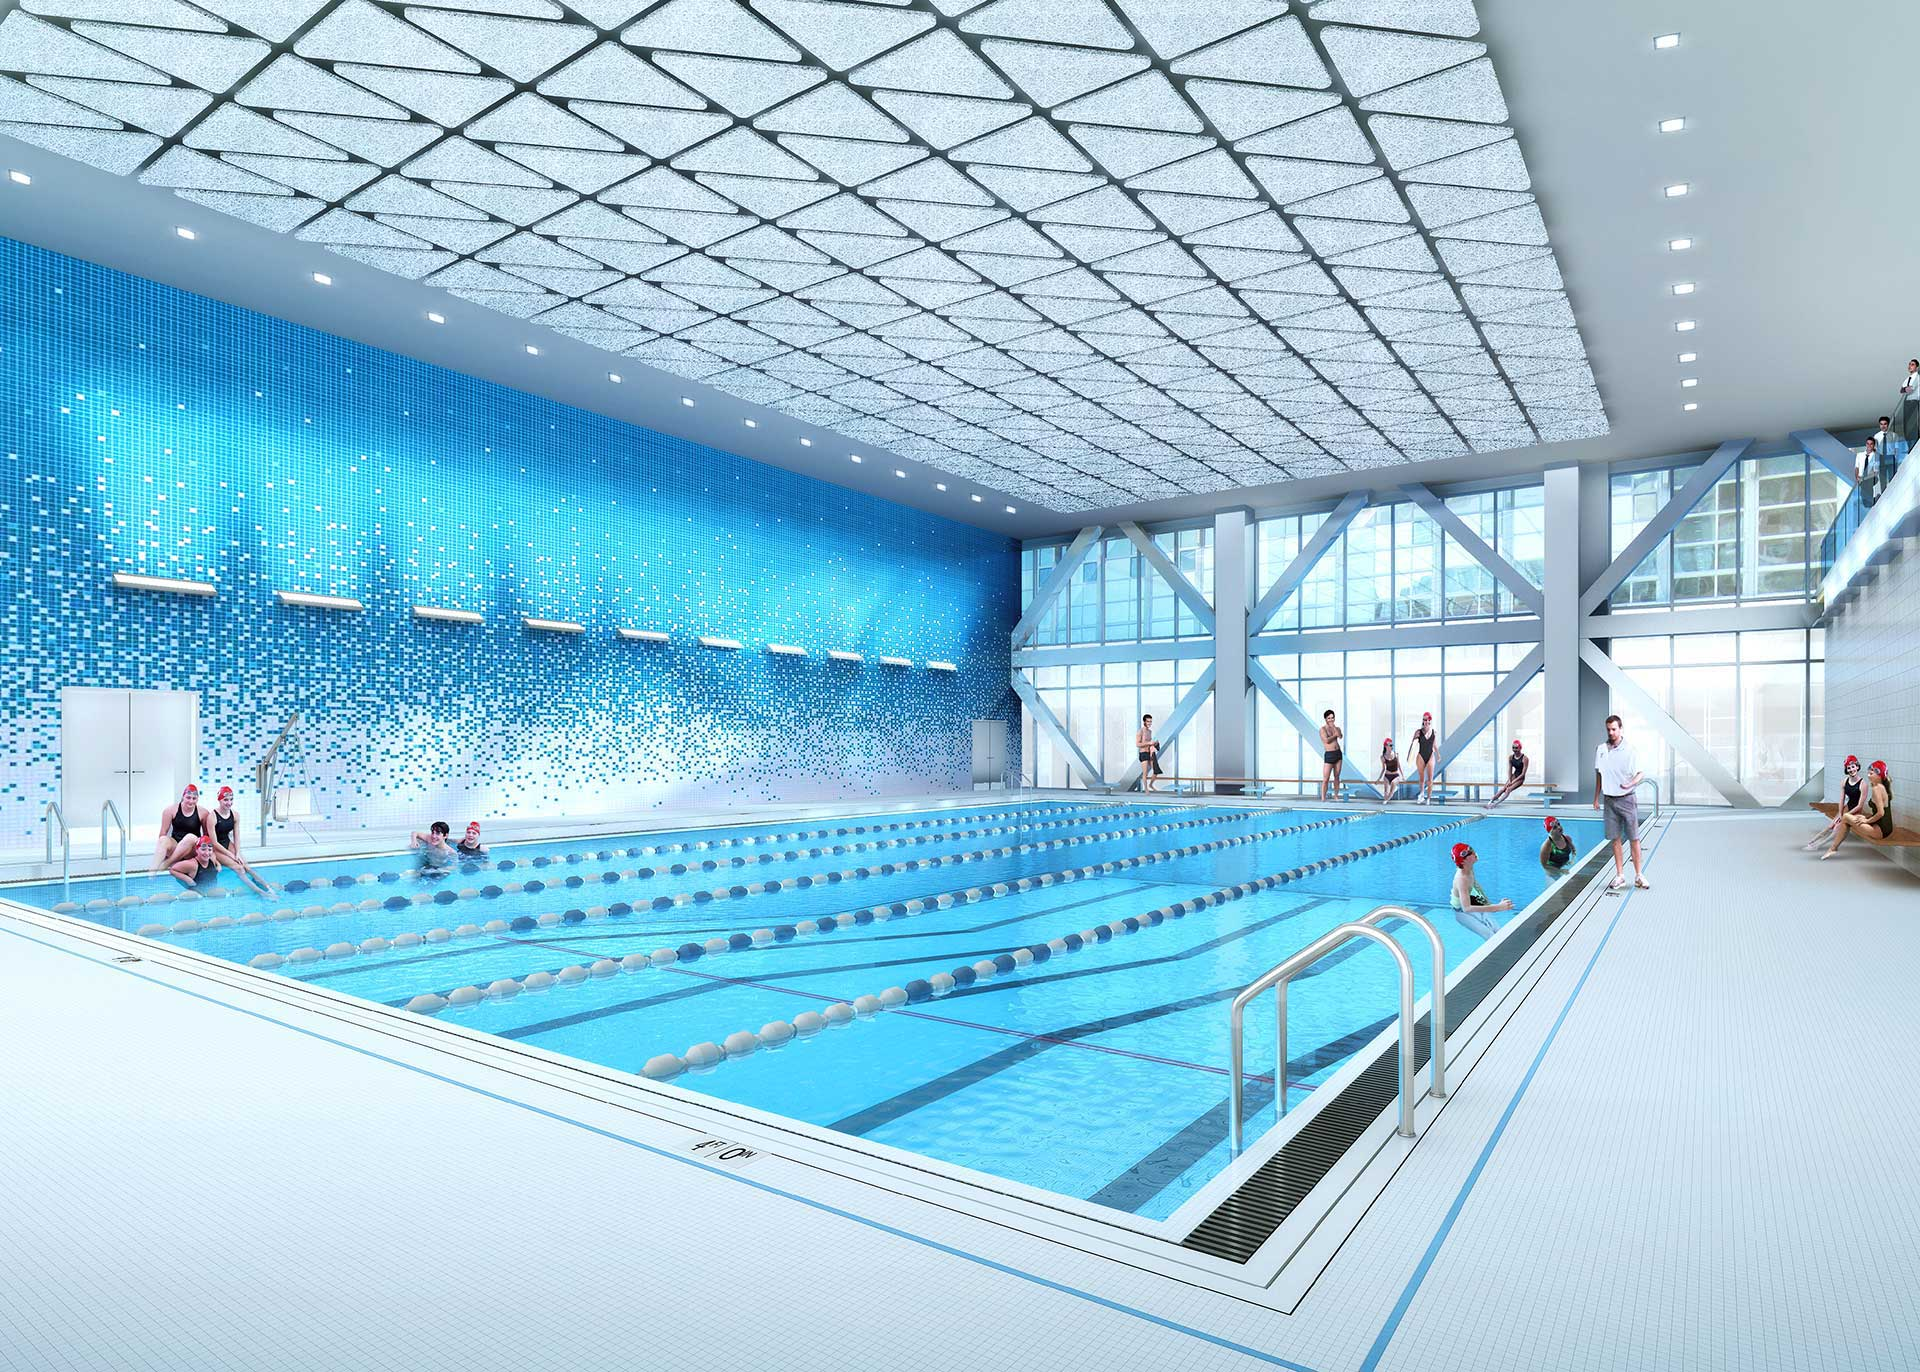 GEMS Upper Pool